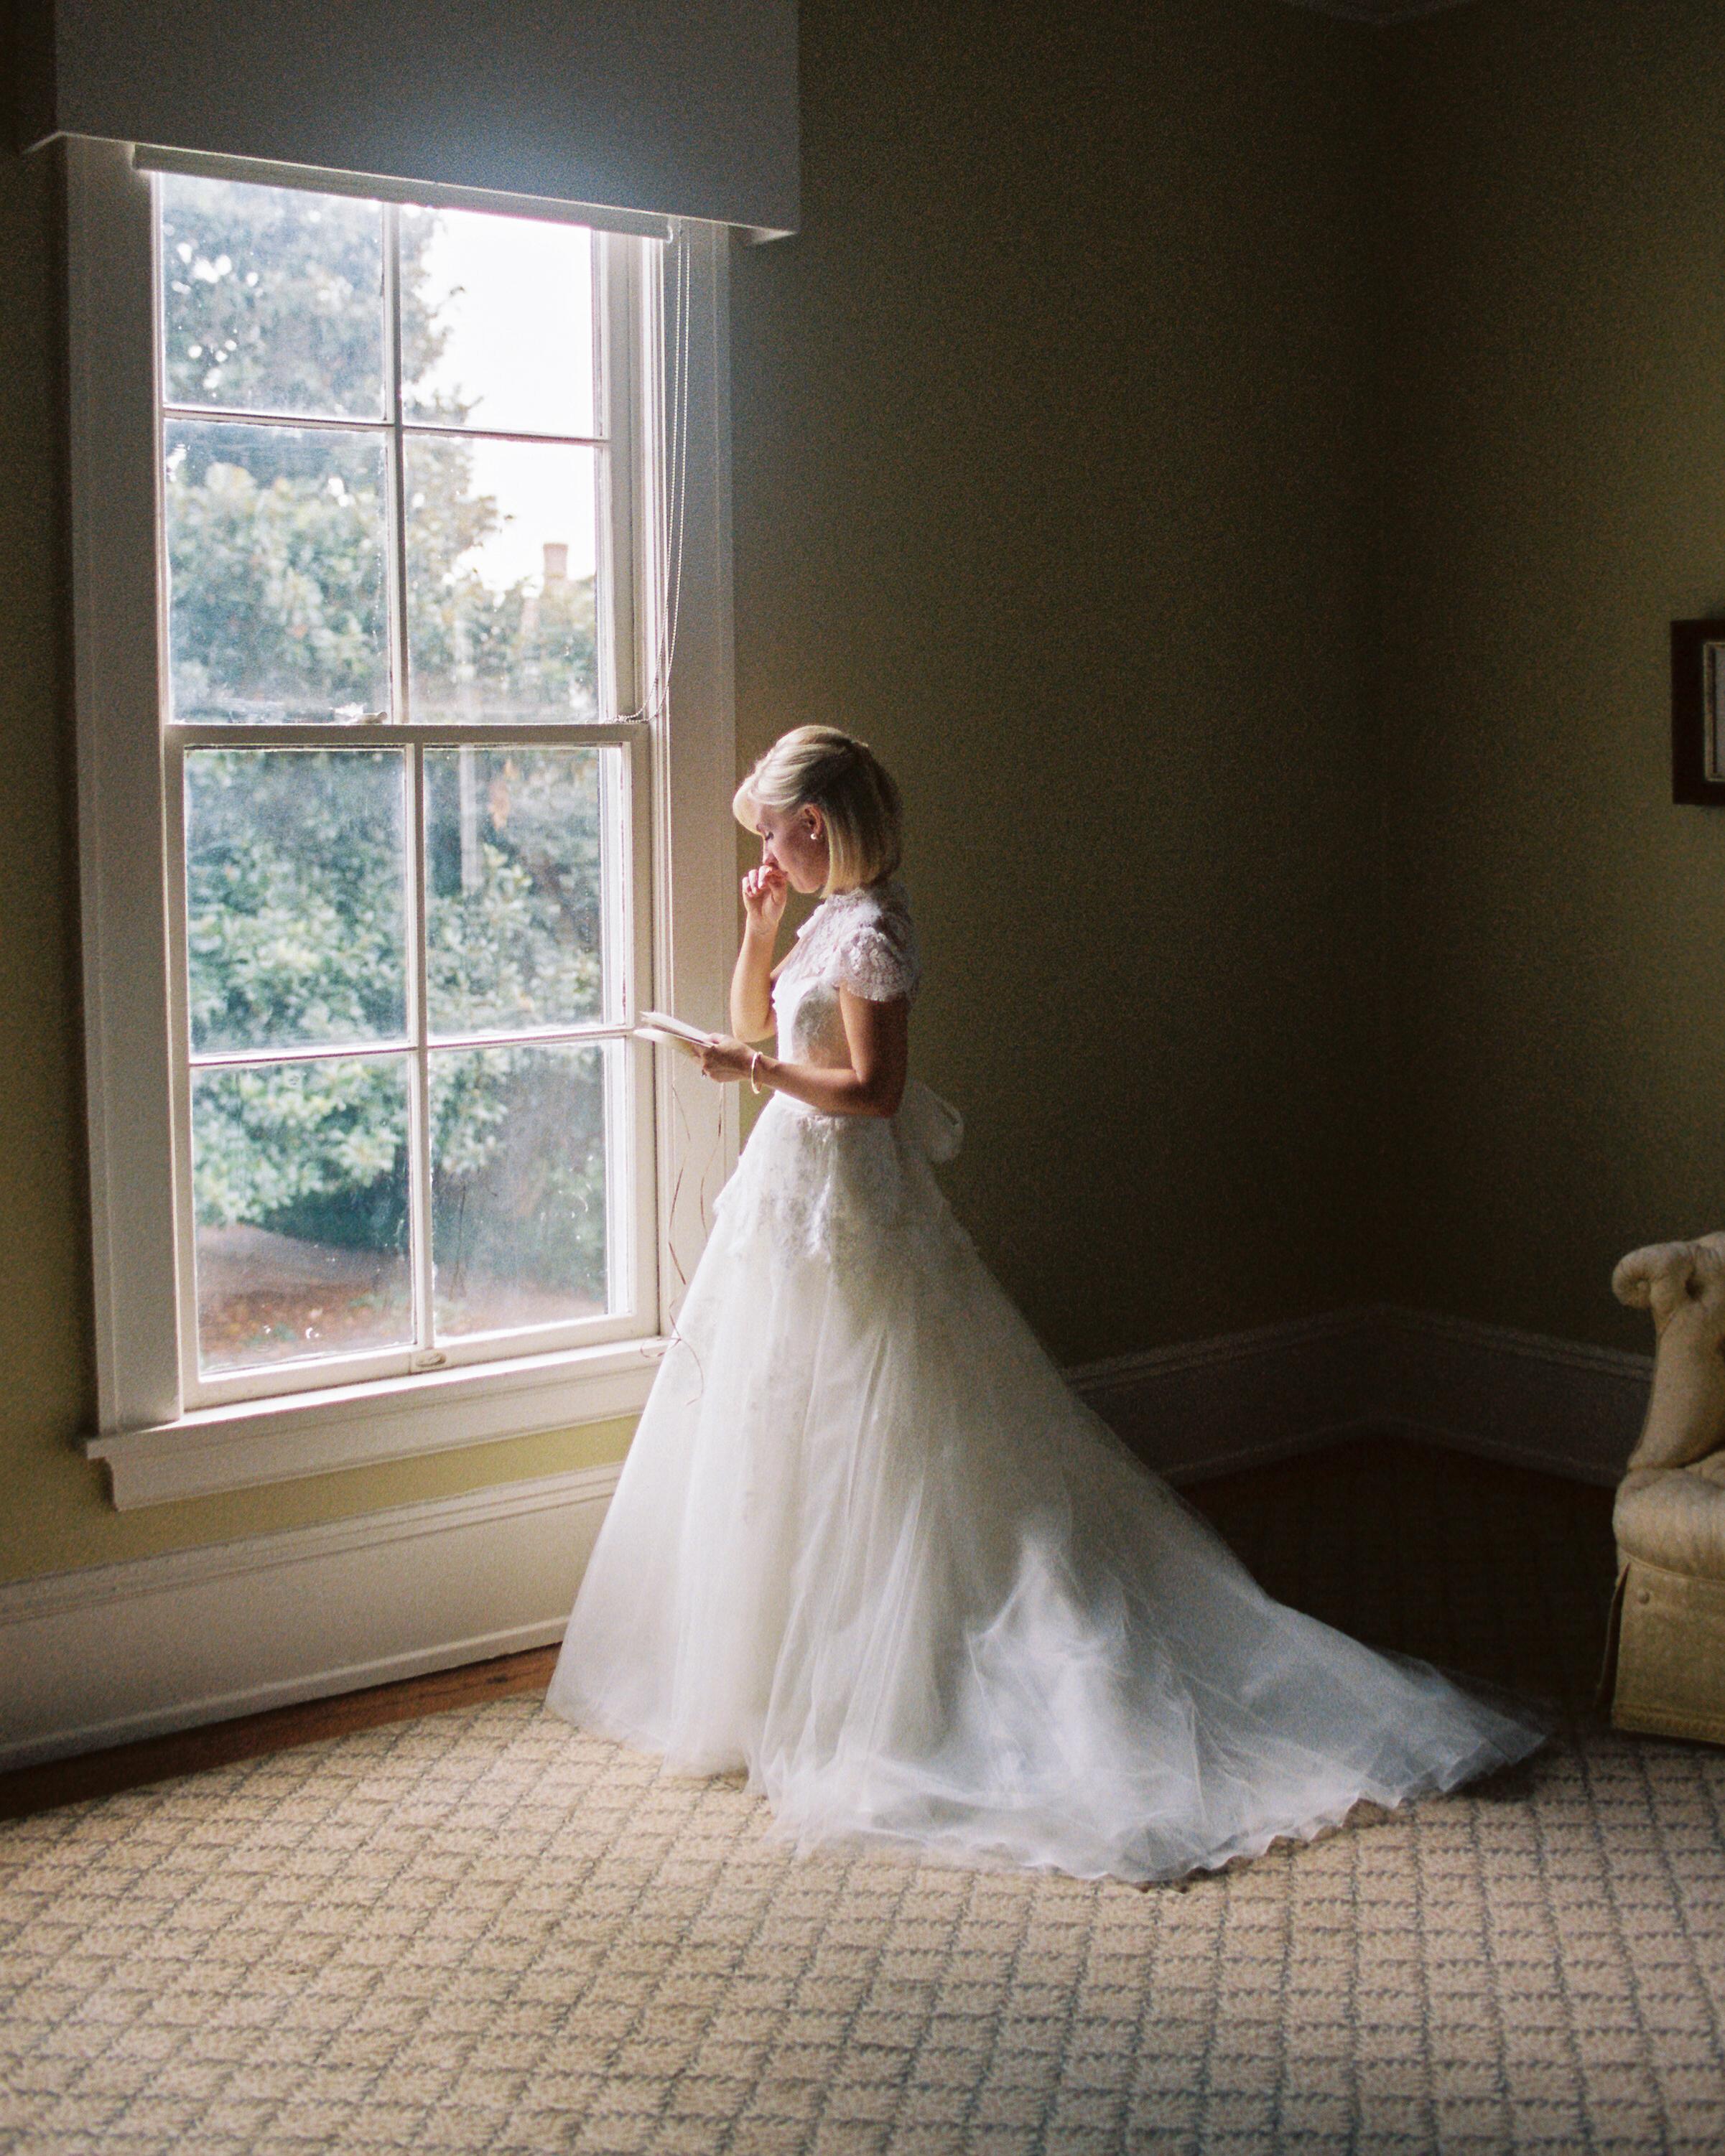 molly-patrick-wedding-note-3013-s111760-0115.jpg